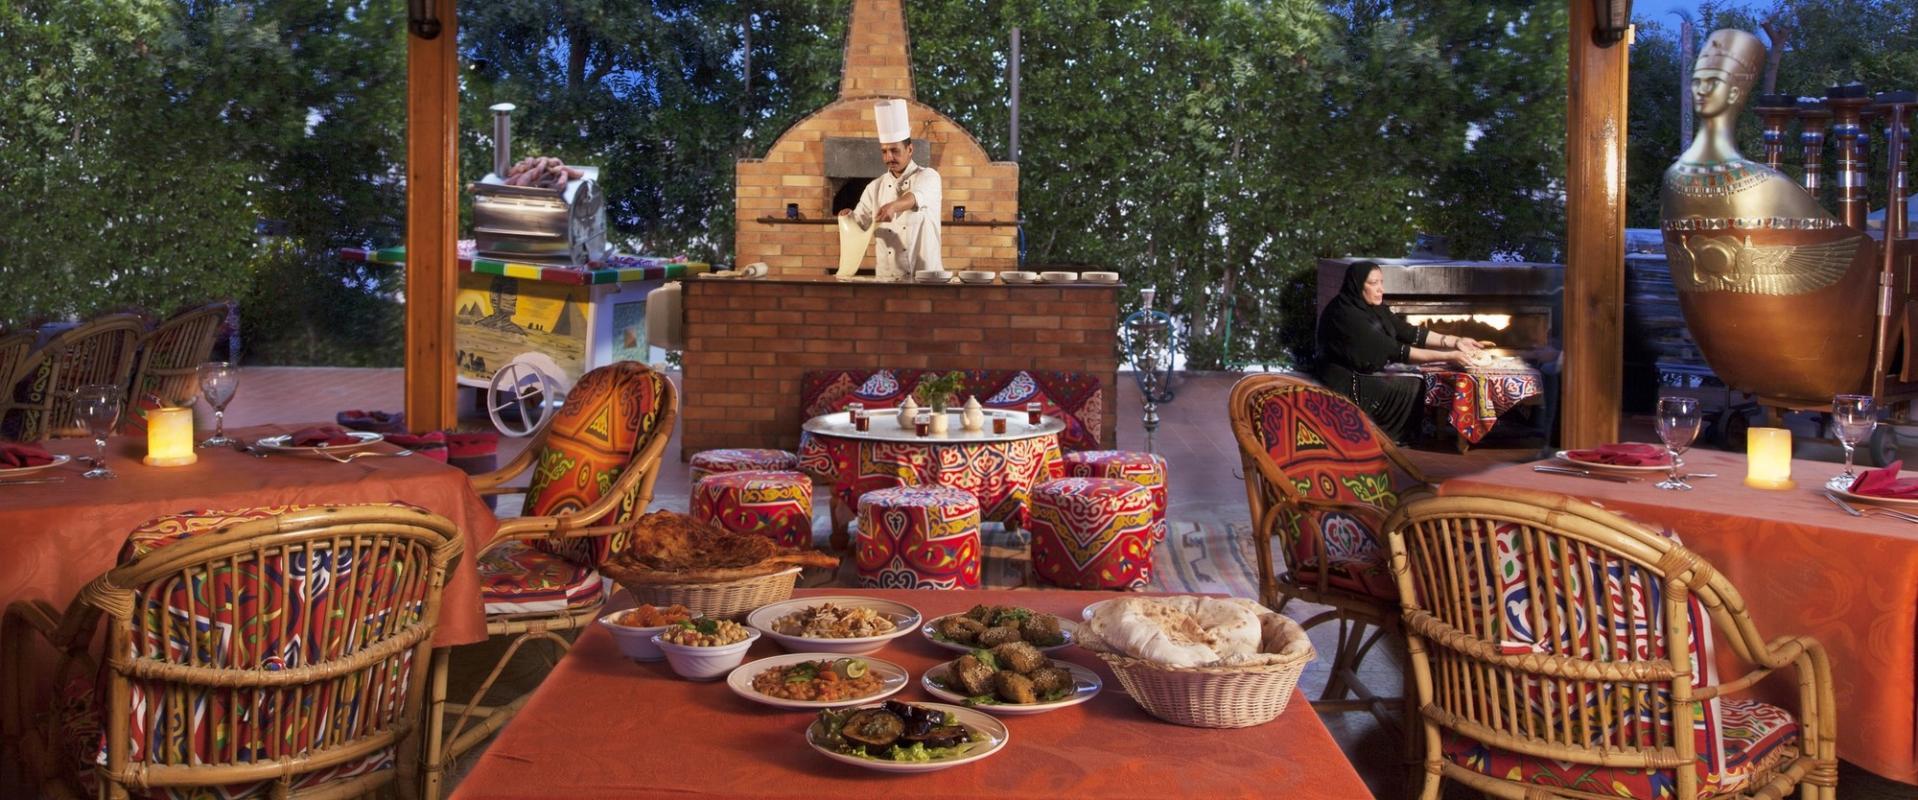 http://egypte.croisiere.voyage/wp-content/uploads/2016/11/HRG-SH-Hurghada-Isis-Oriental-Restaurant.jpg